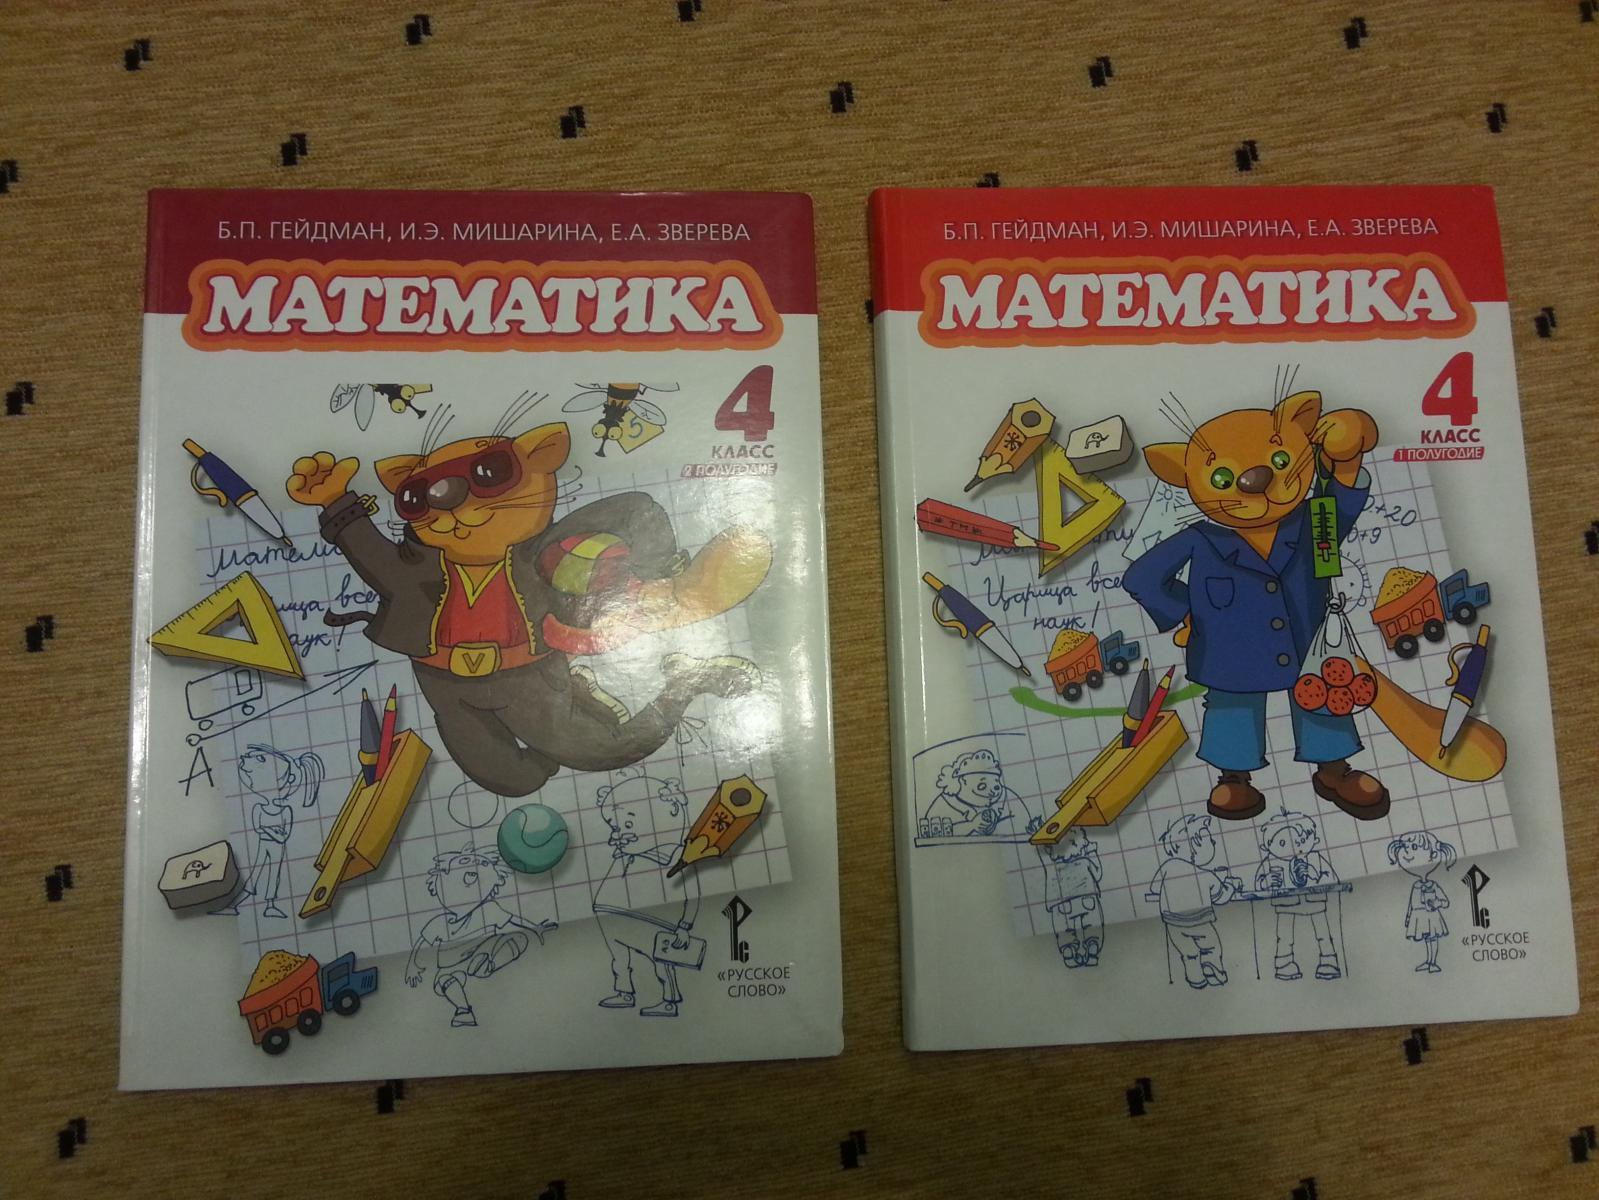 математика 1 класс атамура решебник